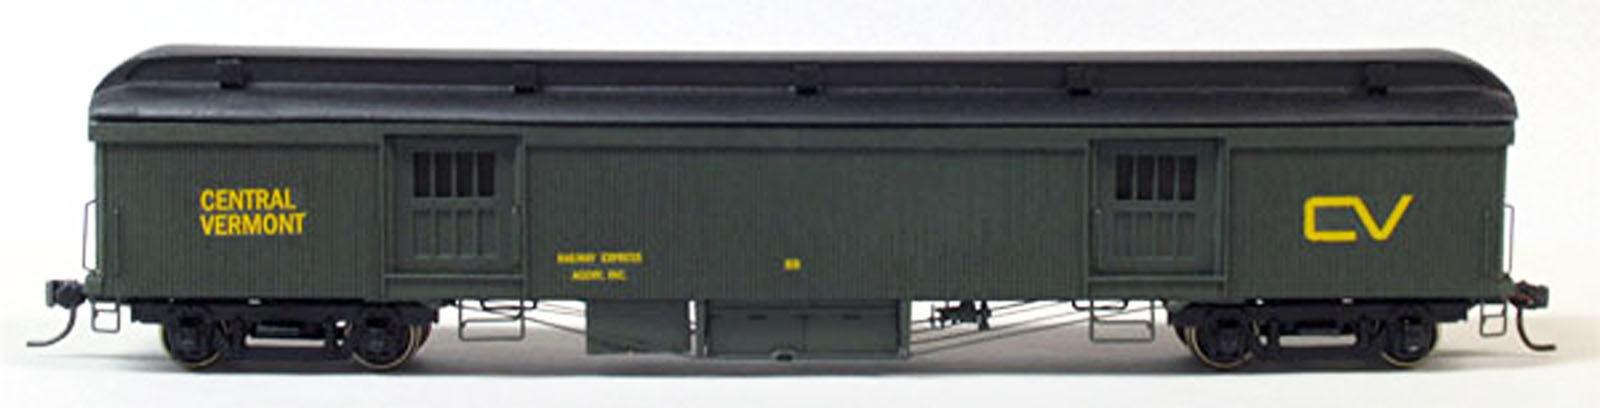 CENTRAL VERMONT WOOD BAGGAGE CAR HO Model Railroad Unpainted Craftsman Kit SPK40